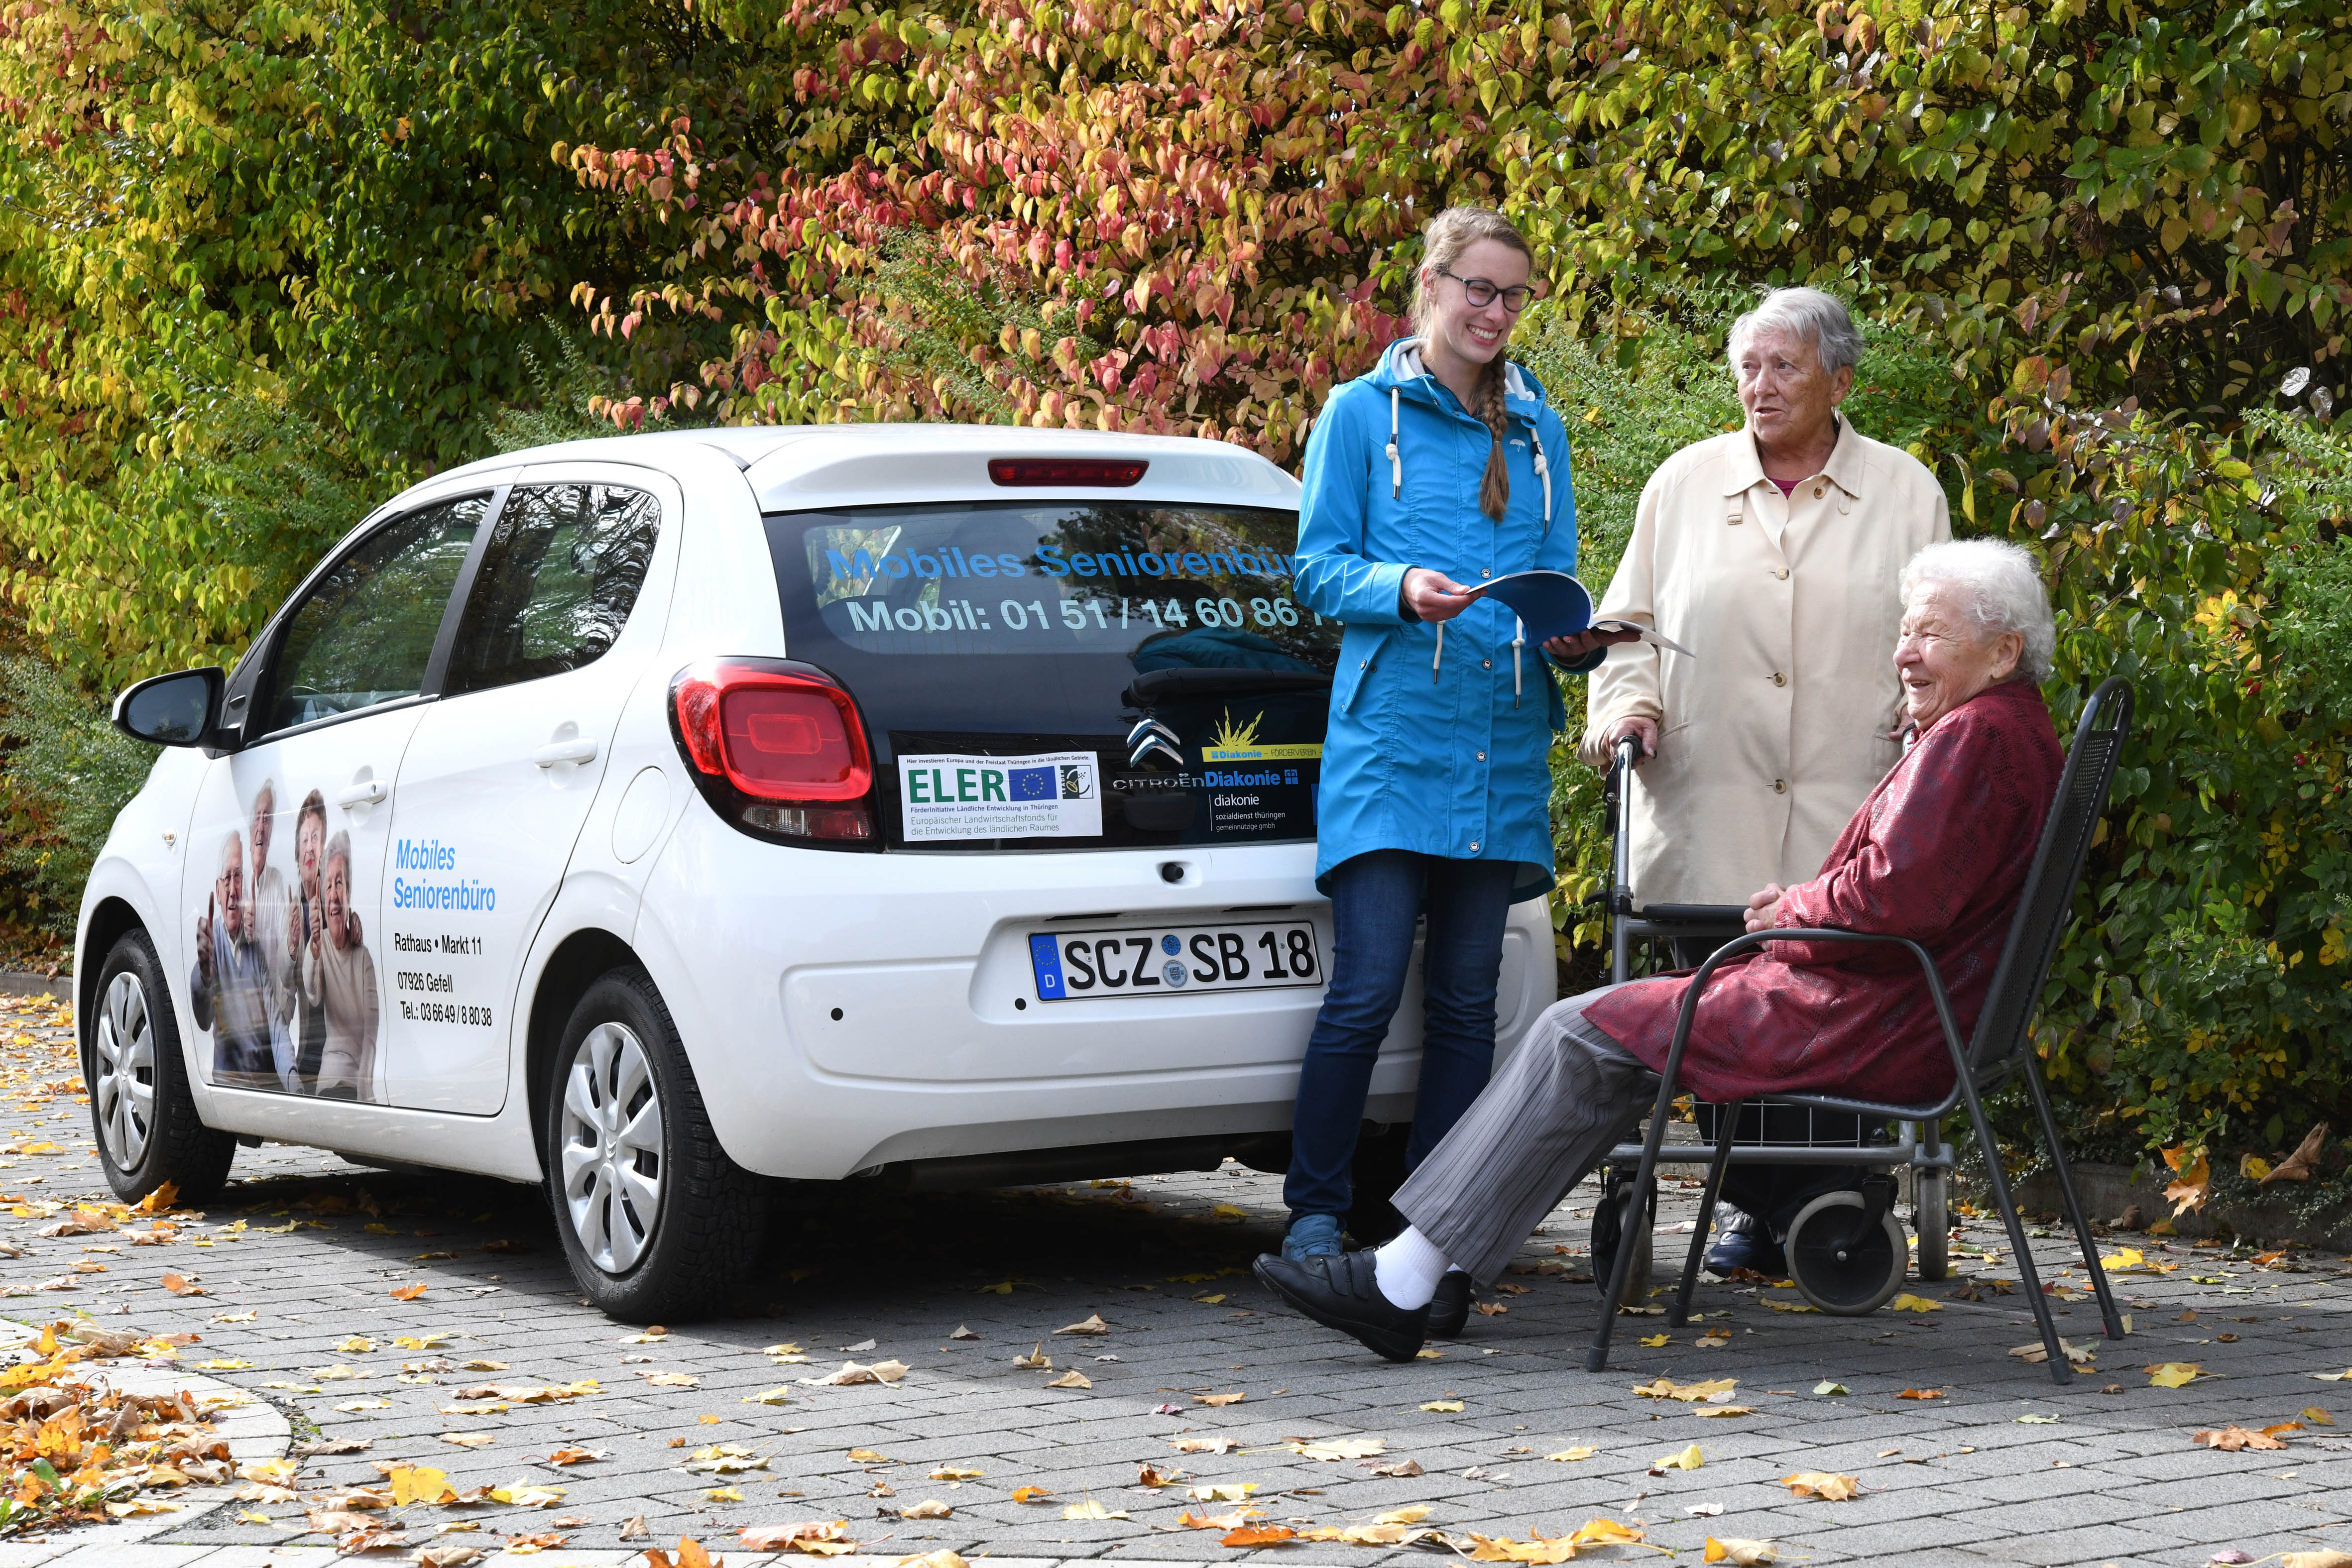 Mobile Seniorenberatung im Saale-Orla-Kreis, Quelle: Diakoniestiftung Weimar Bad Lobenstein gGmbH